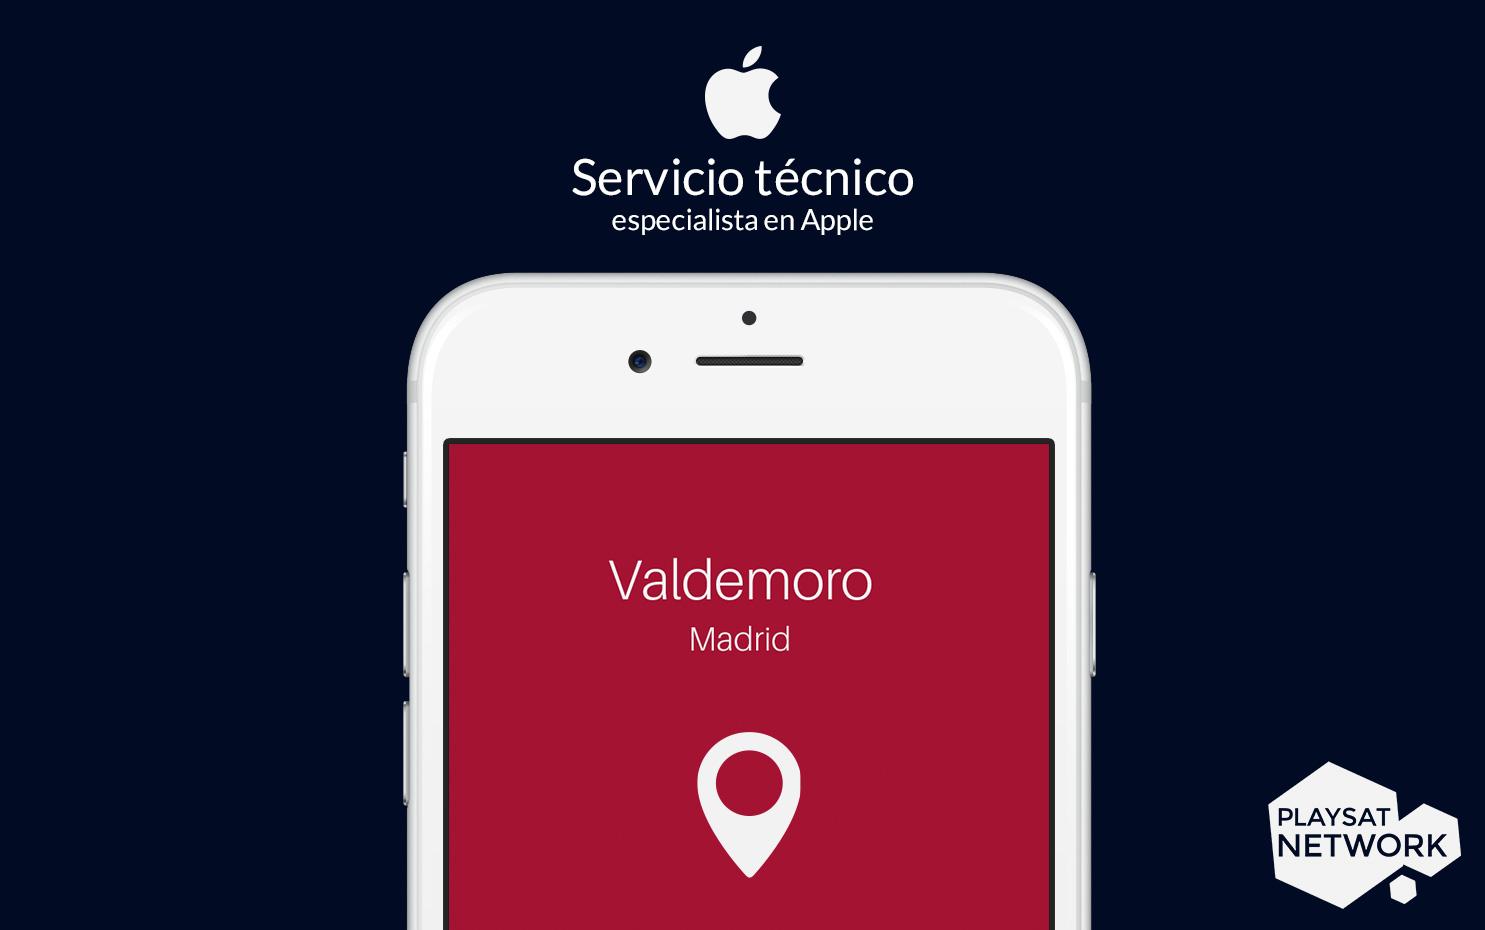 Servicio-Técnico-Apple-Valdemoro